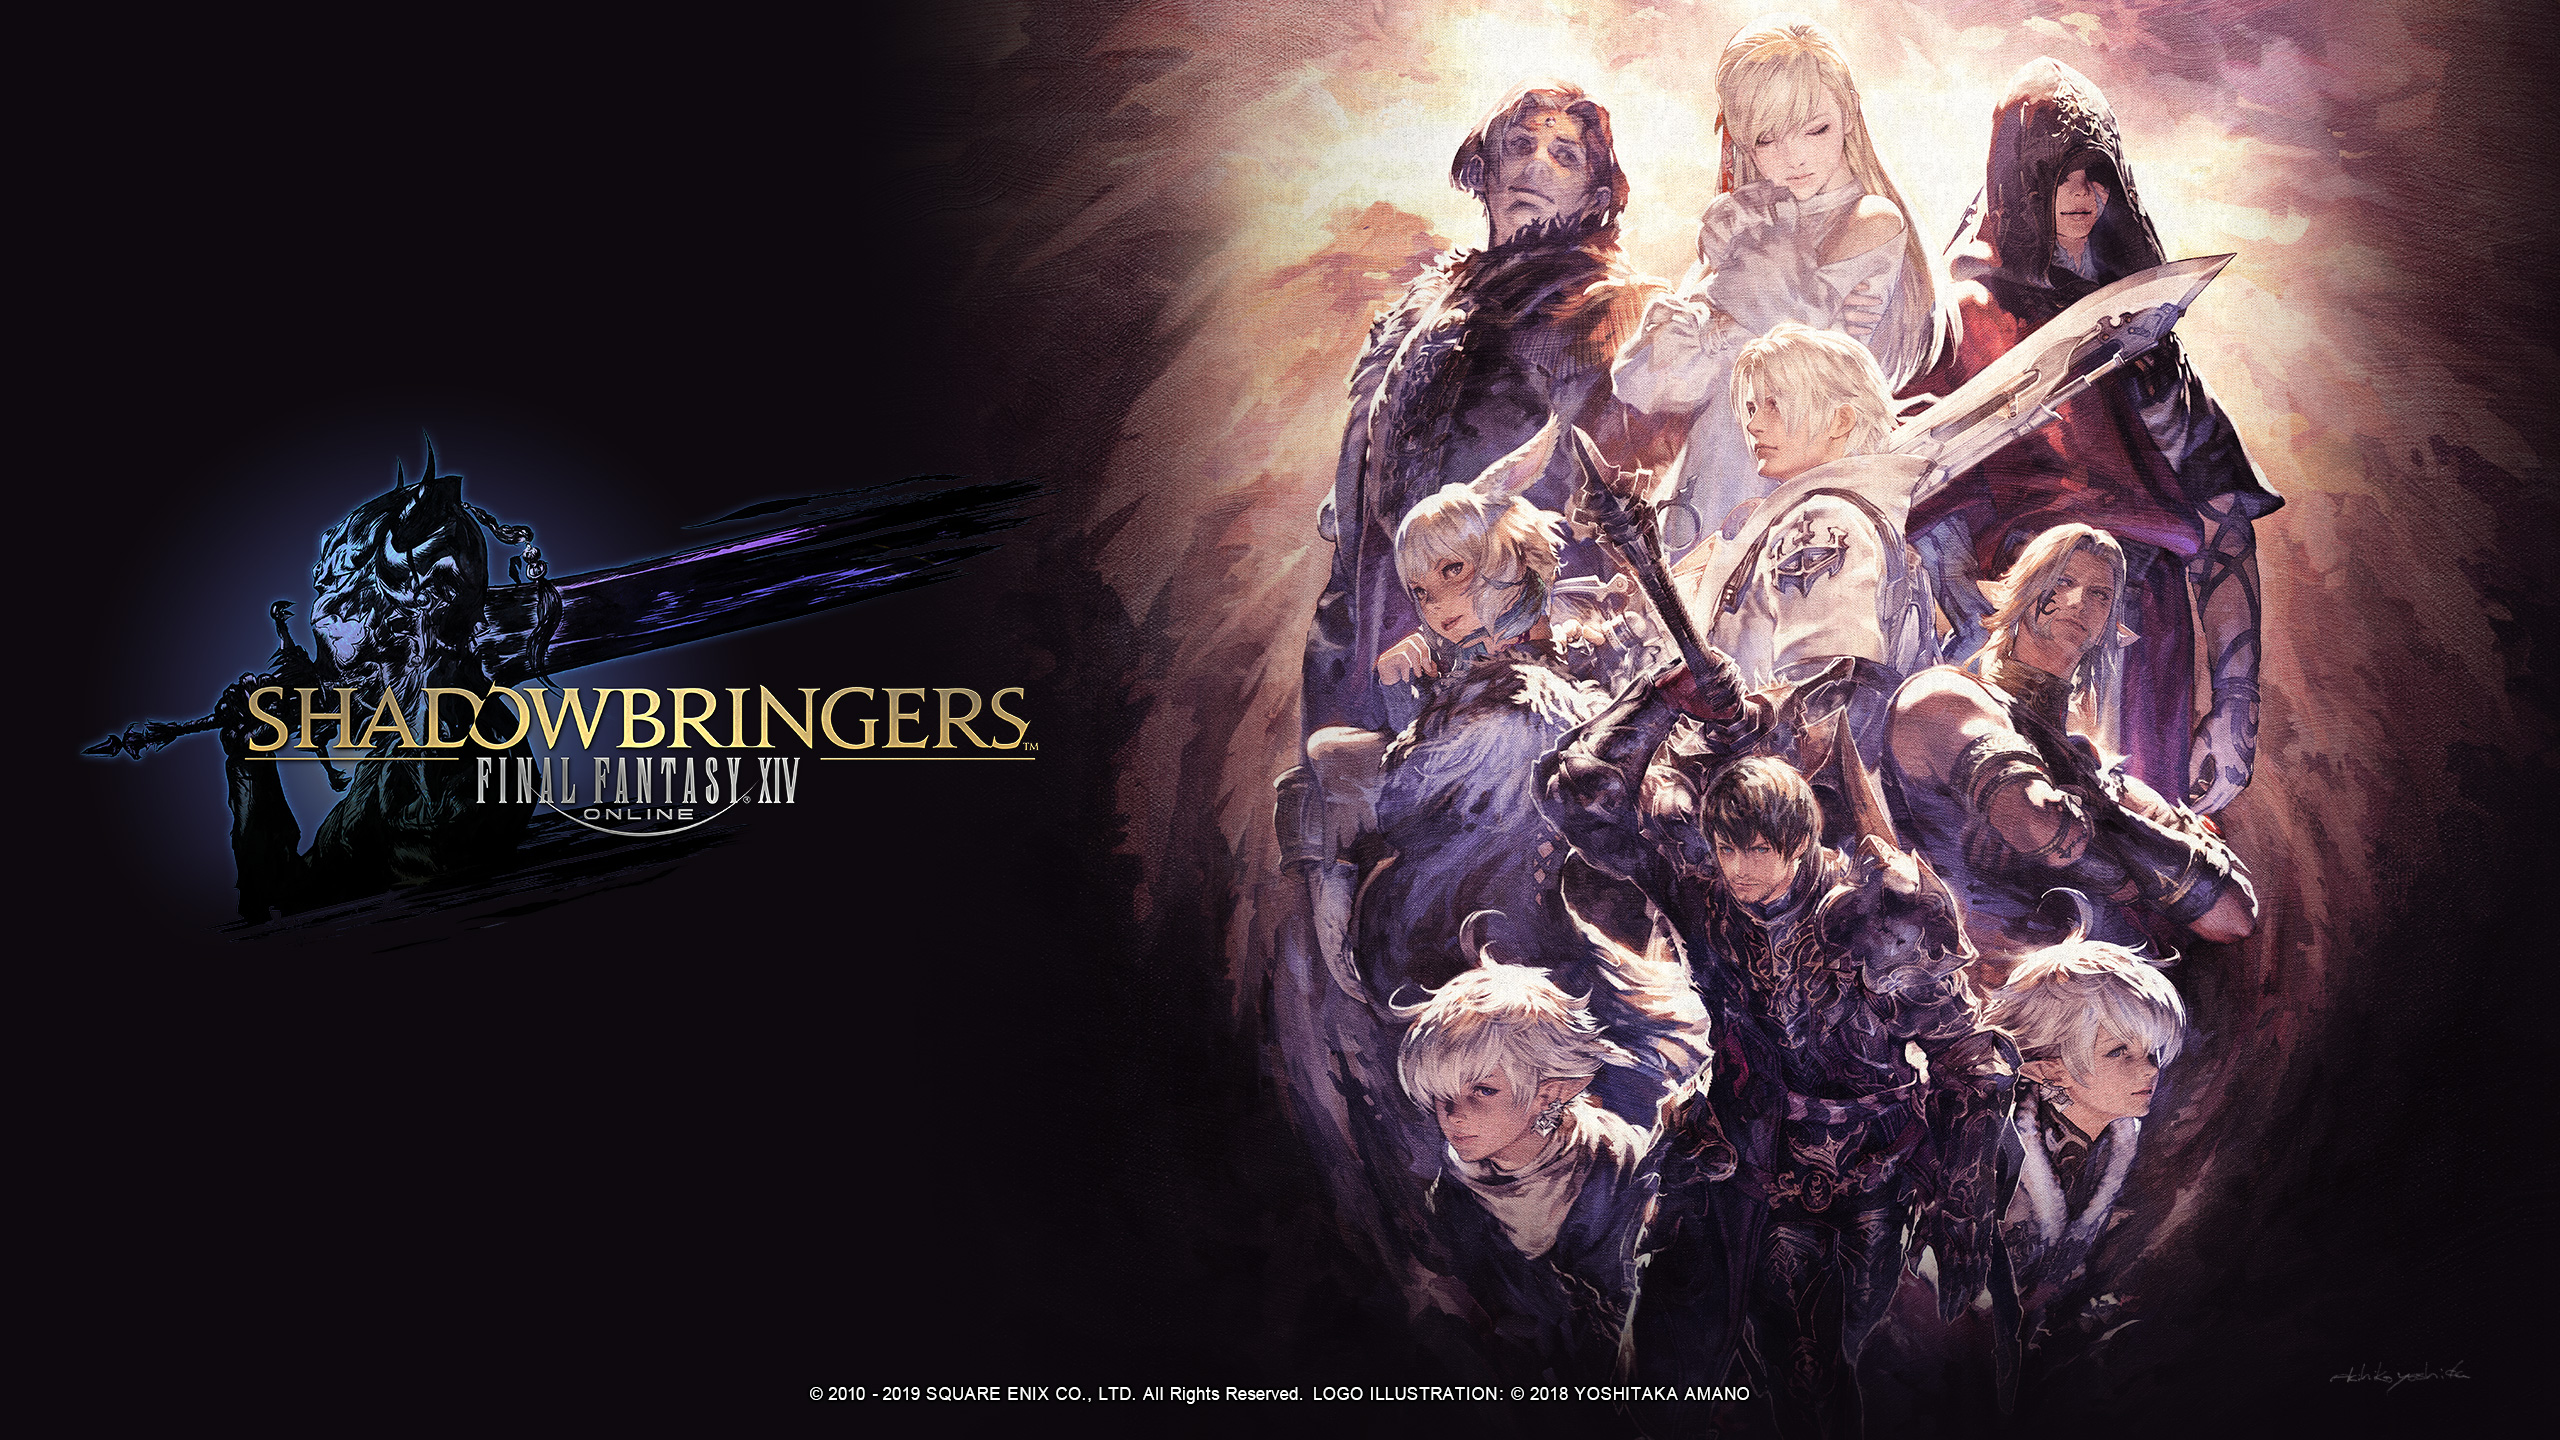 Ffxivファンキット更新 Final Fantasy Xiv The Lodestone